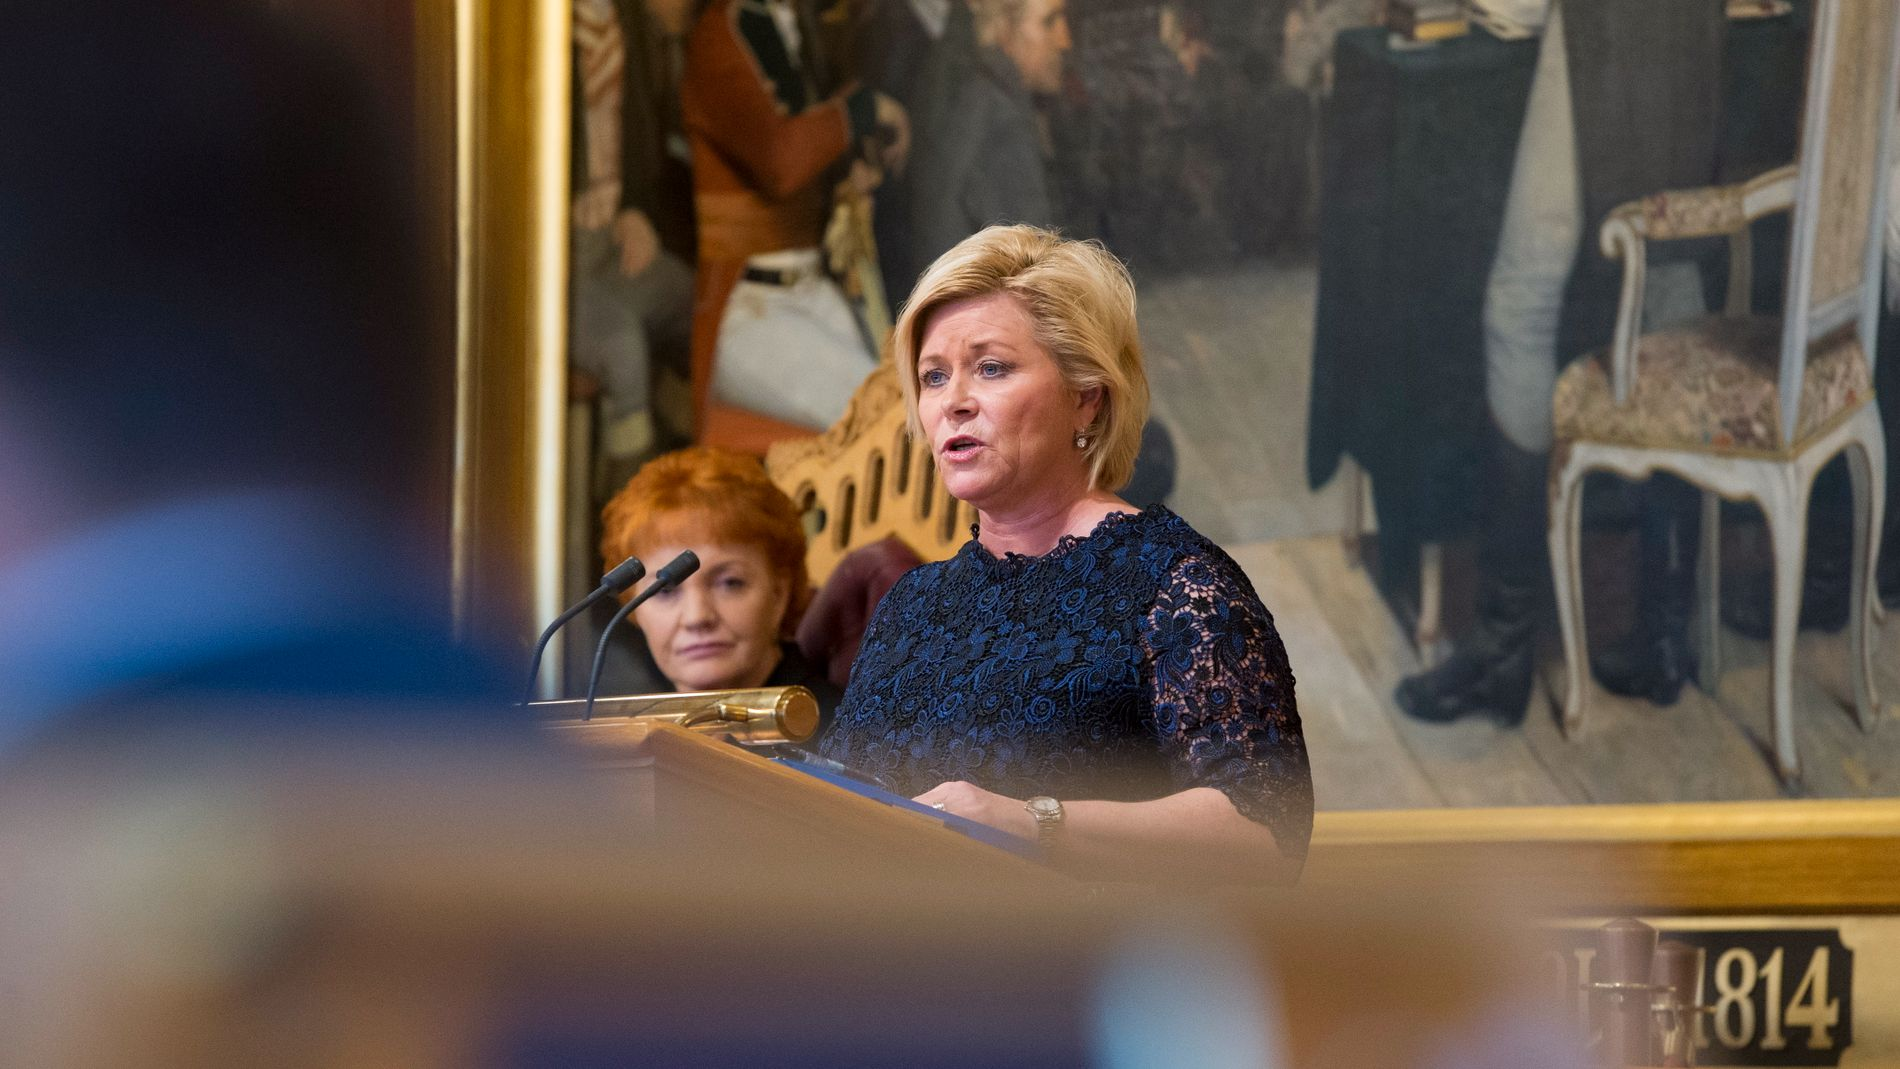 FINANSMINISTER: Siv Jensen (Frp) på talerstolen under finansdebatten på Stortinget.